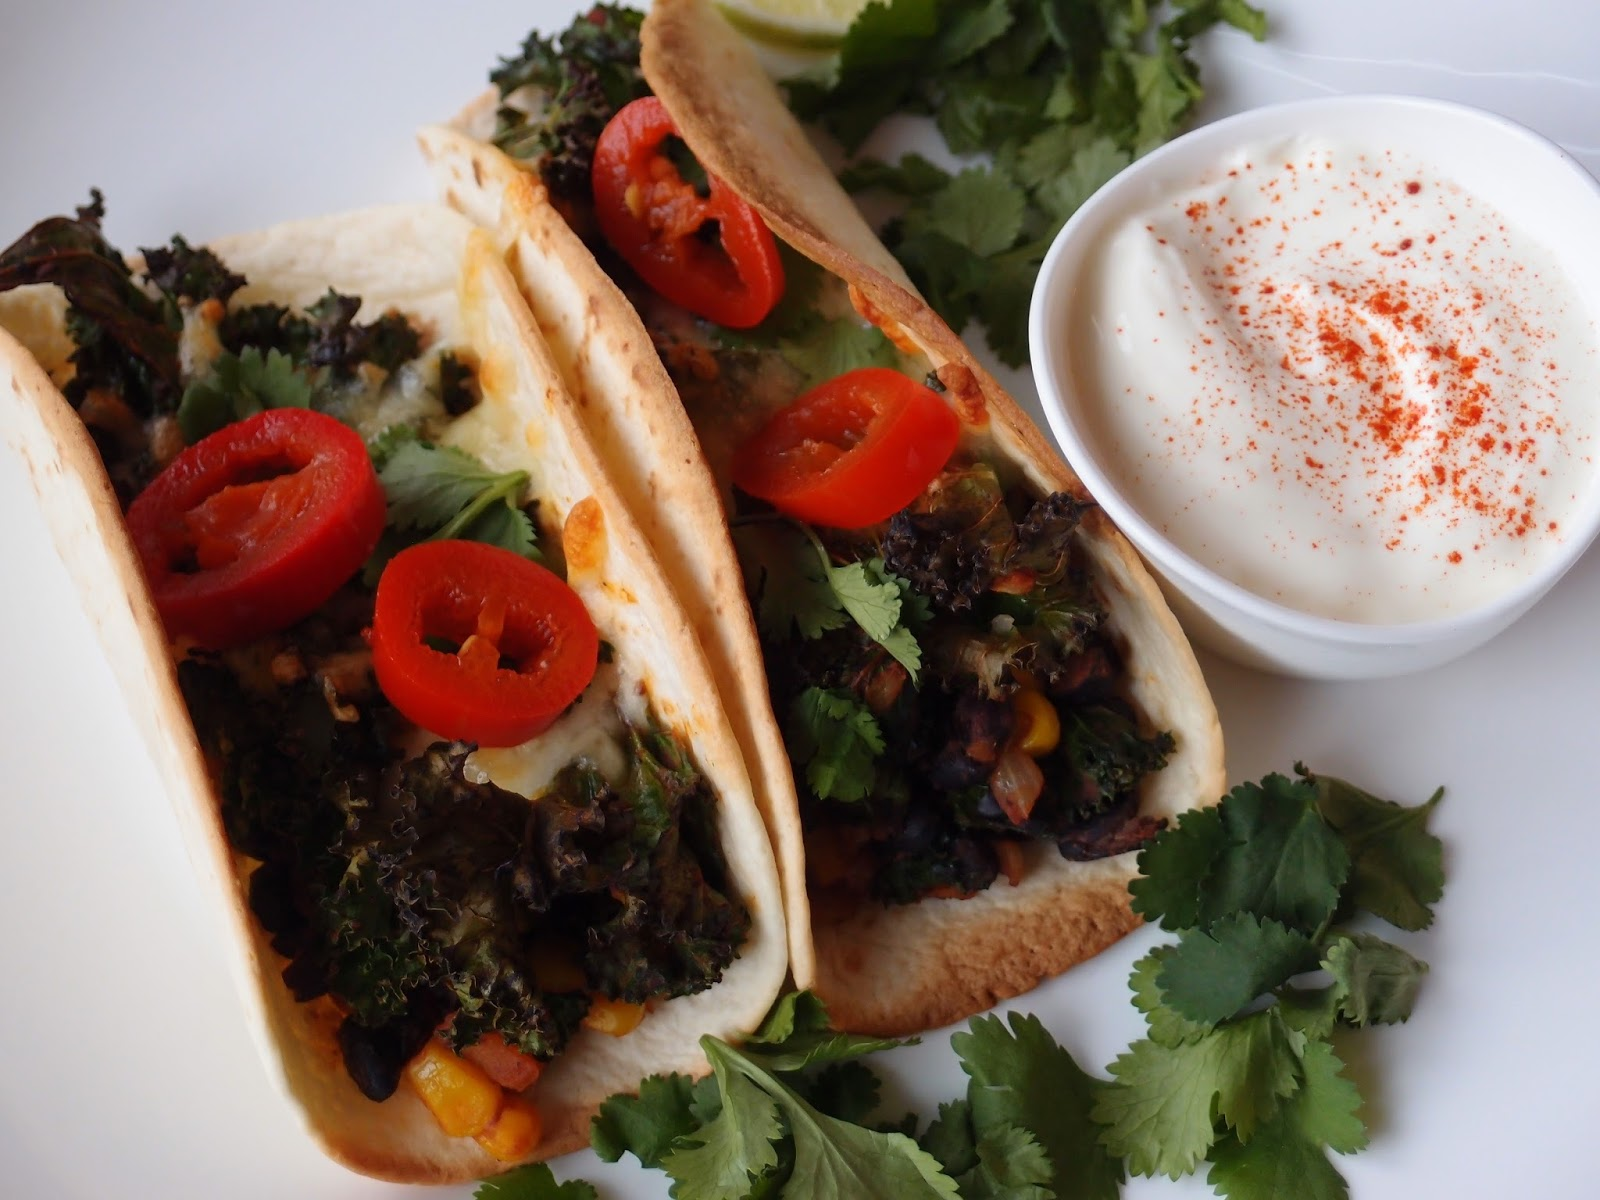 The VegHog: Black bean and kale tacos